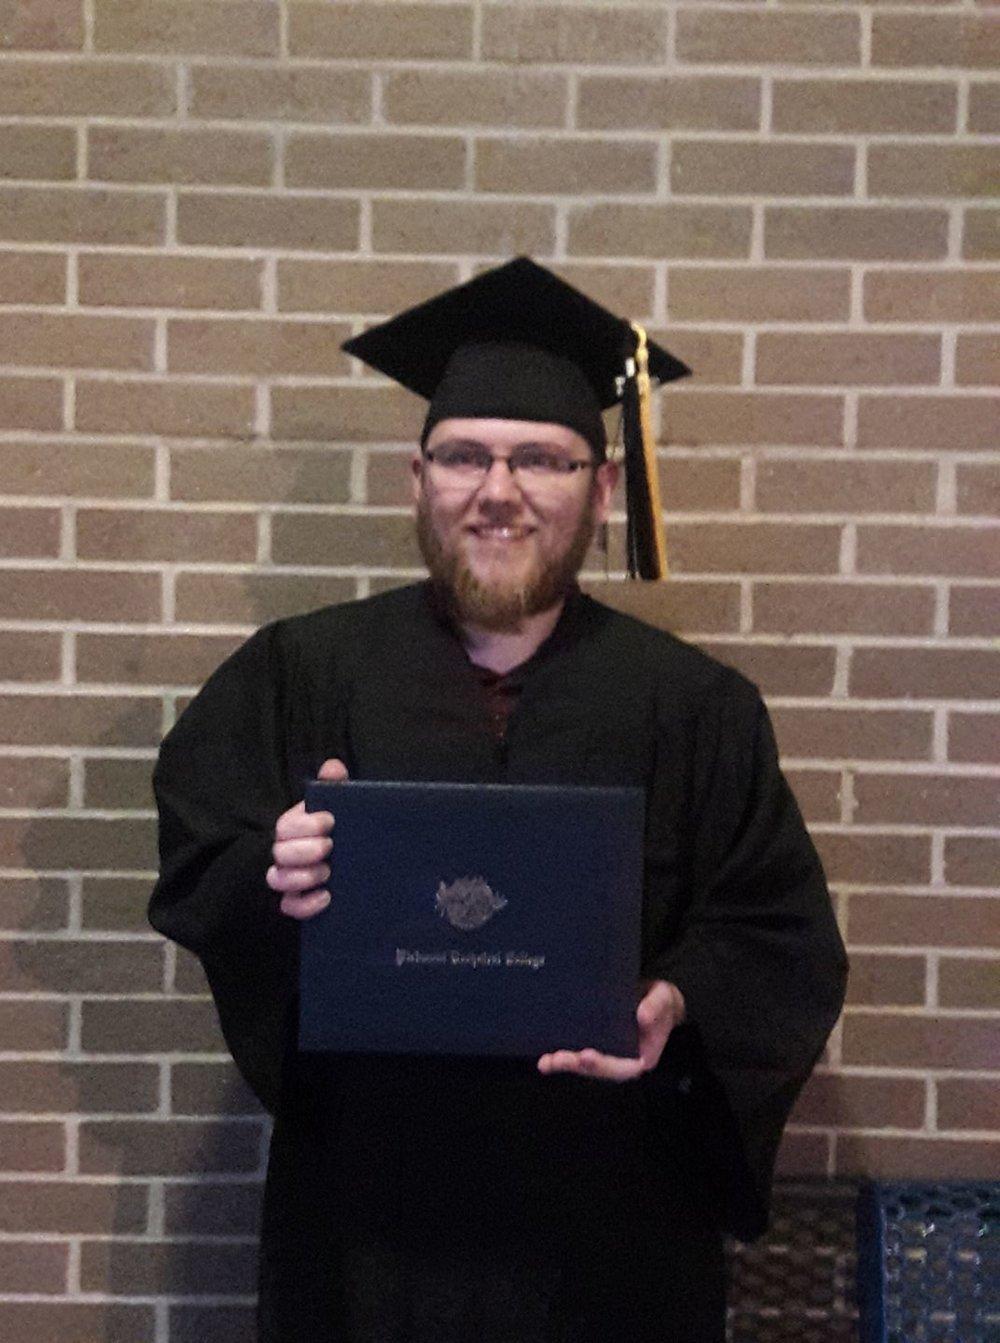 My happy self at graduation.